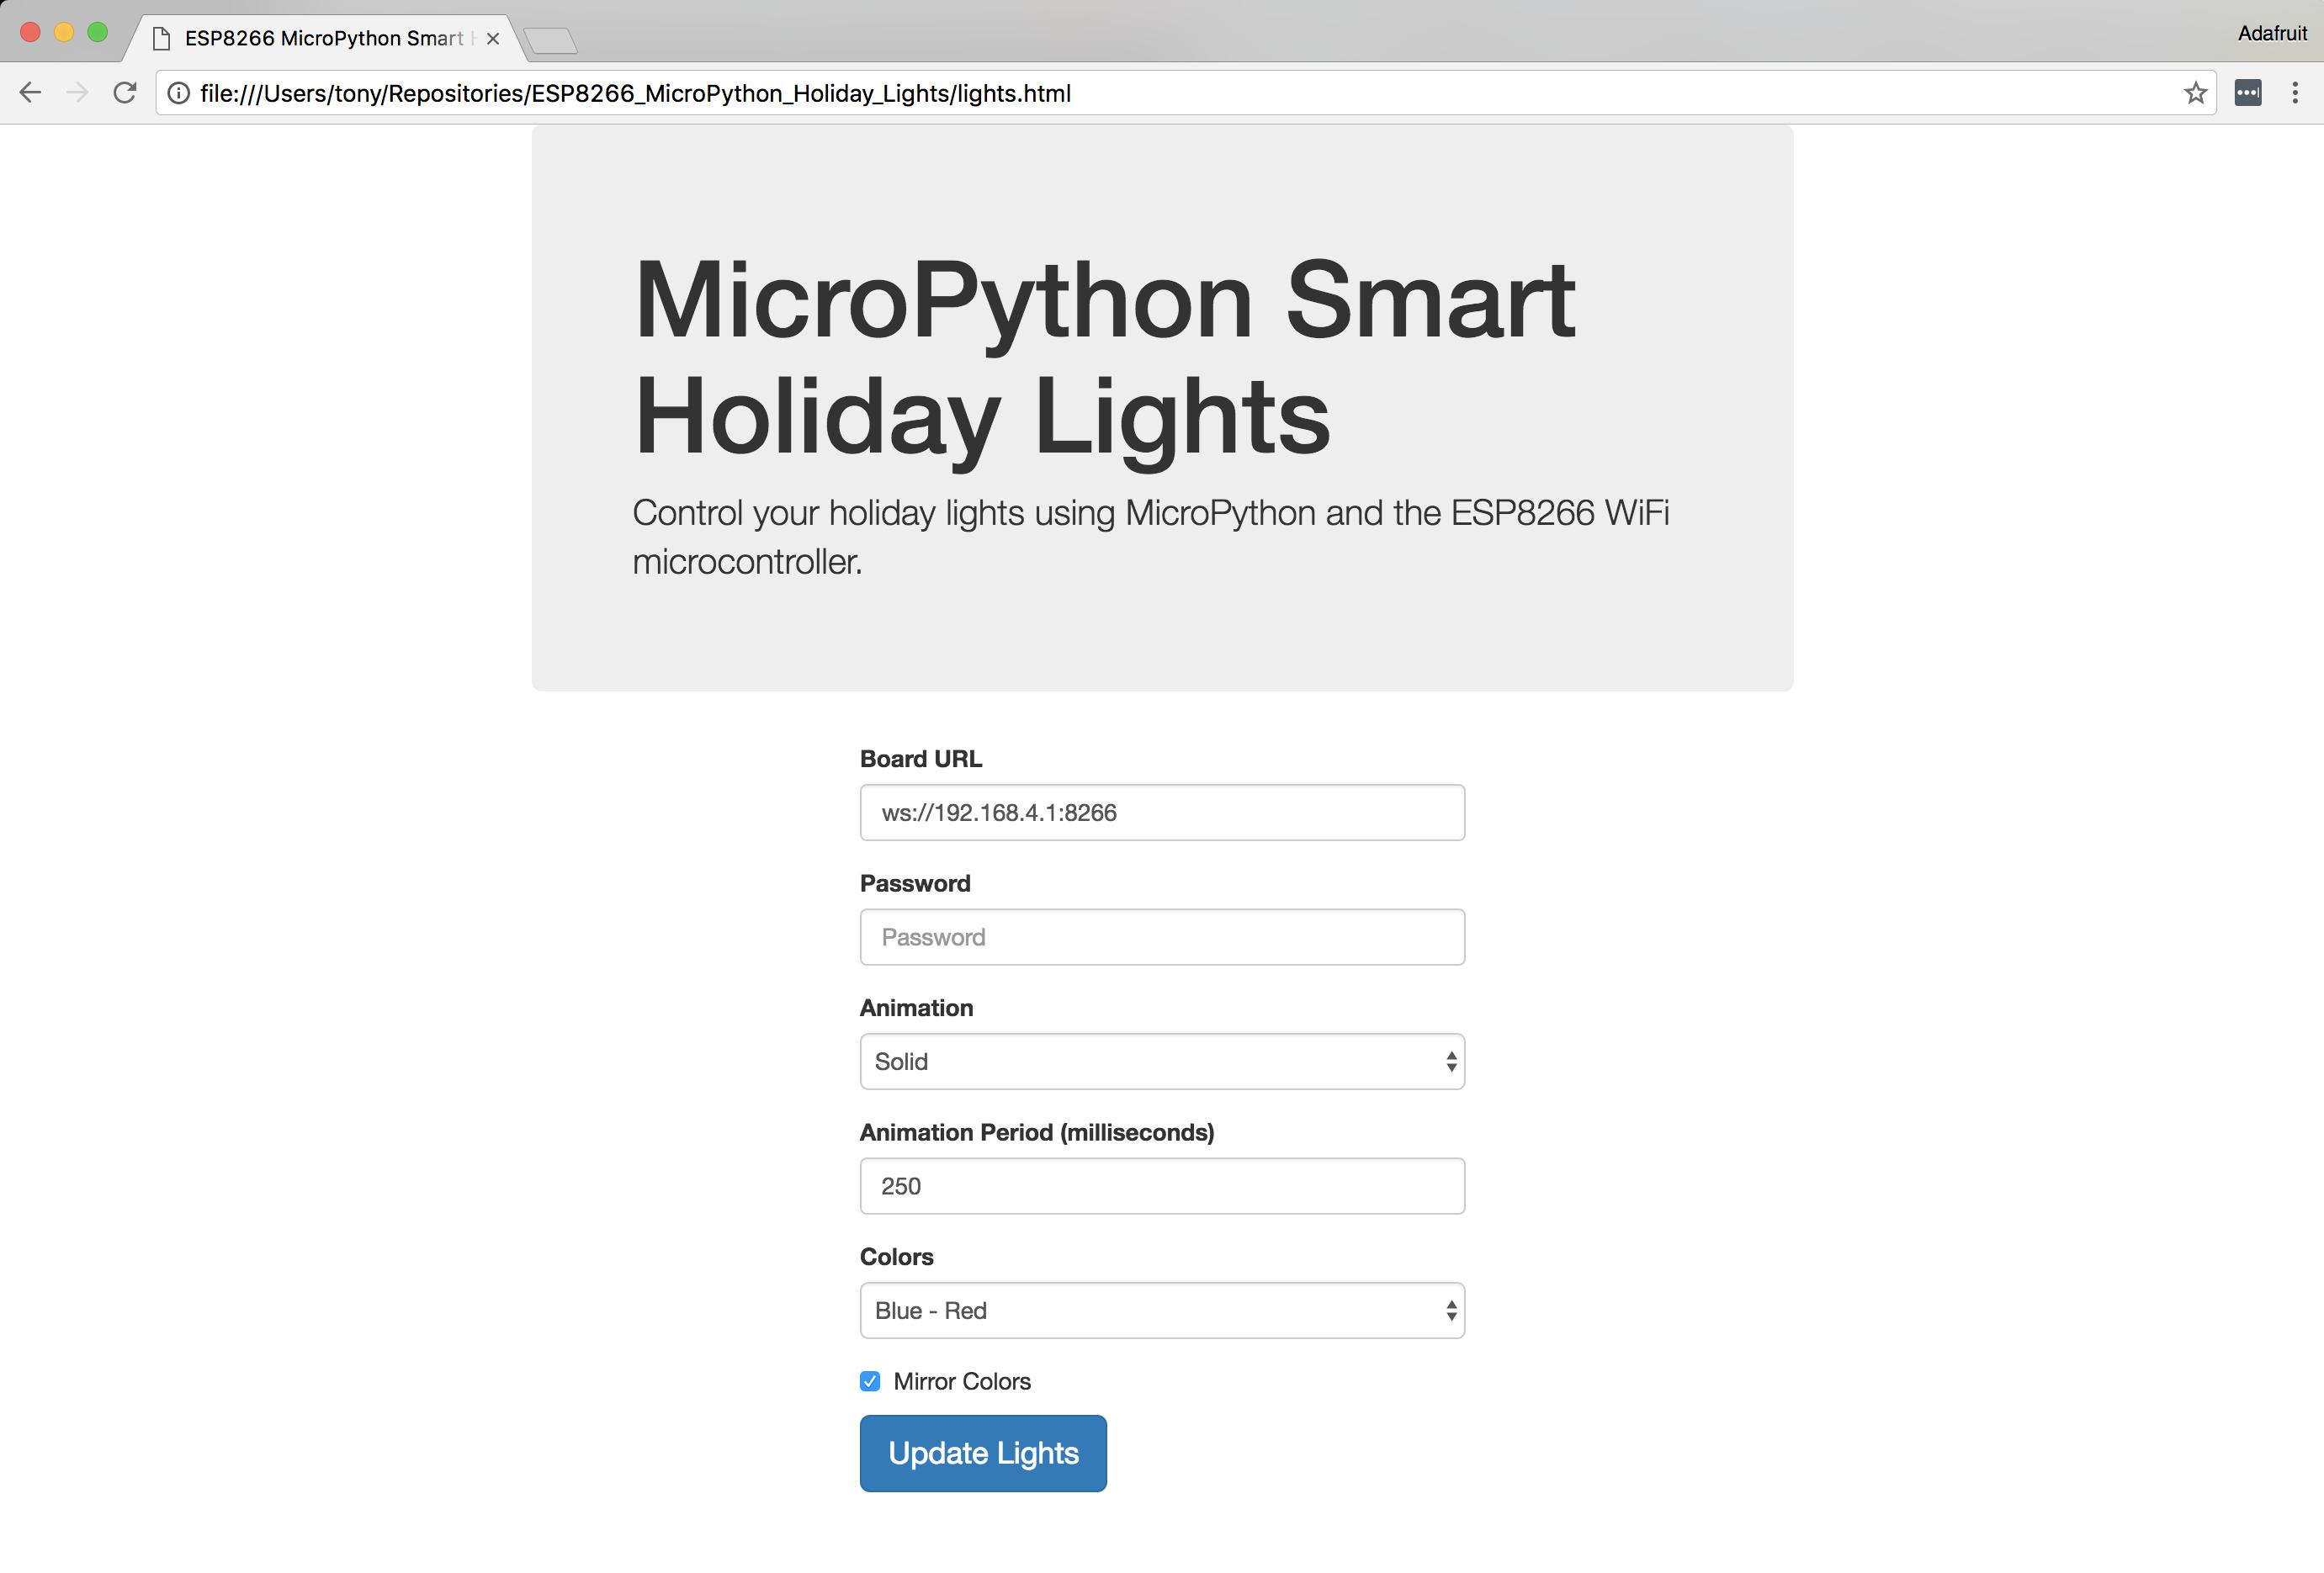 micropython_Screen_Shot_2016-12-09_at_12.20.23_AM.png